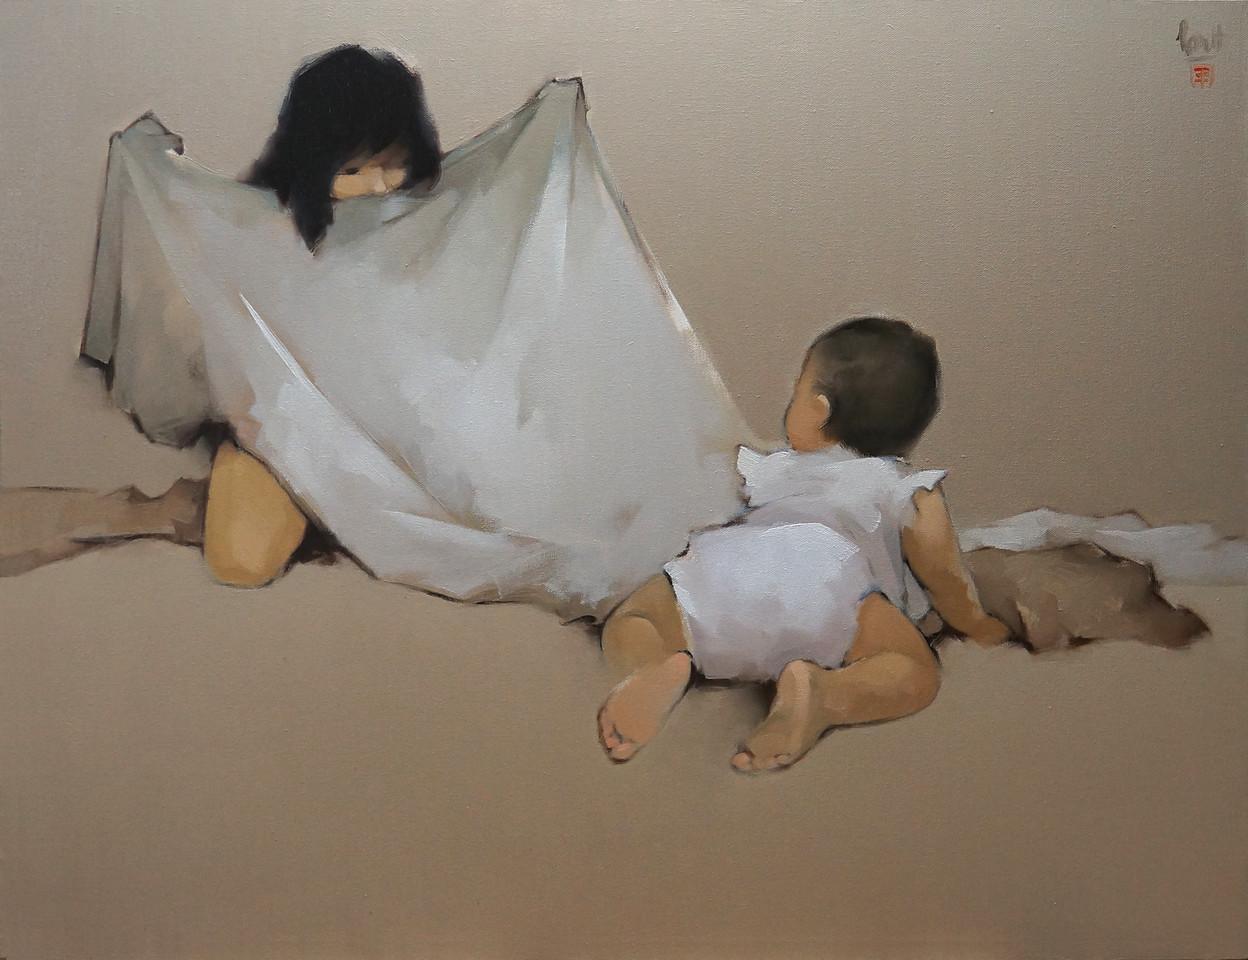 Nguyen Thanh Binh - Peek-a-Boo